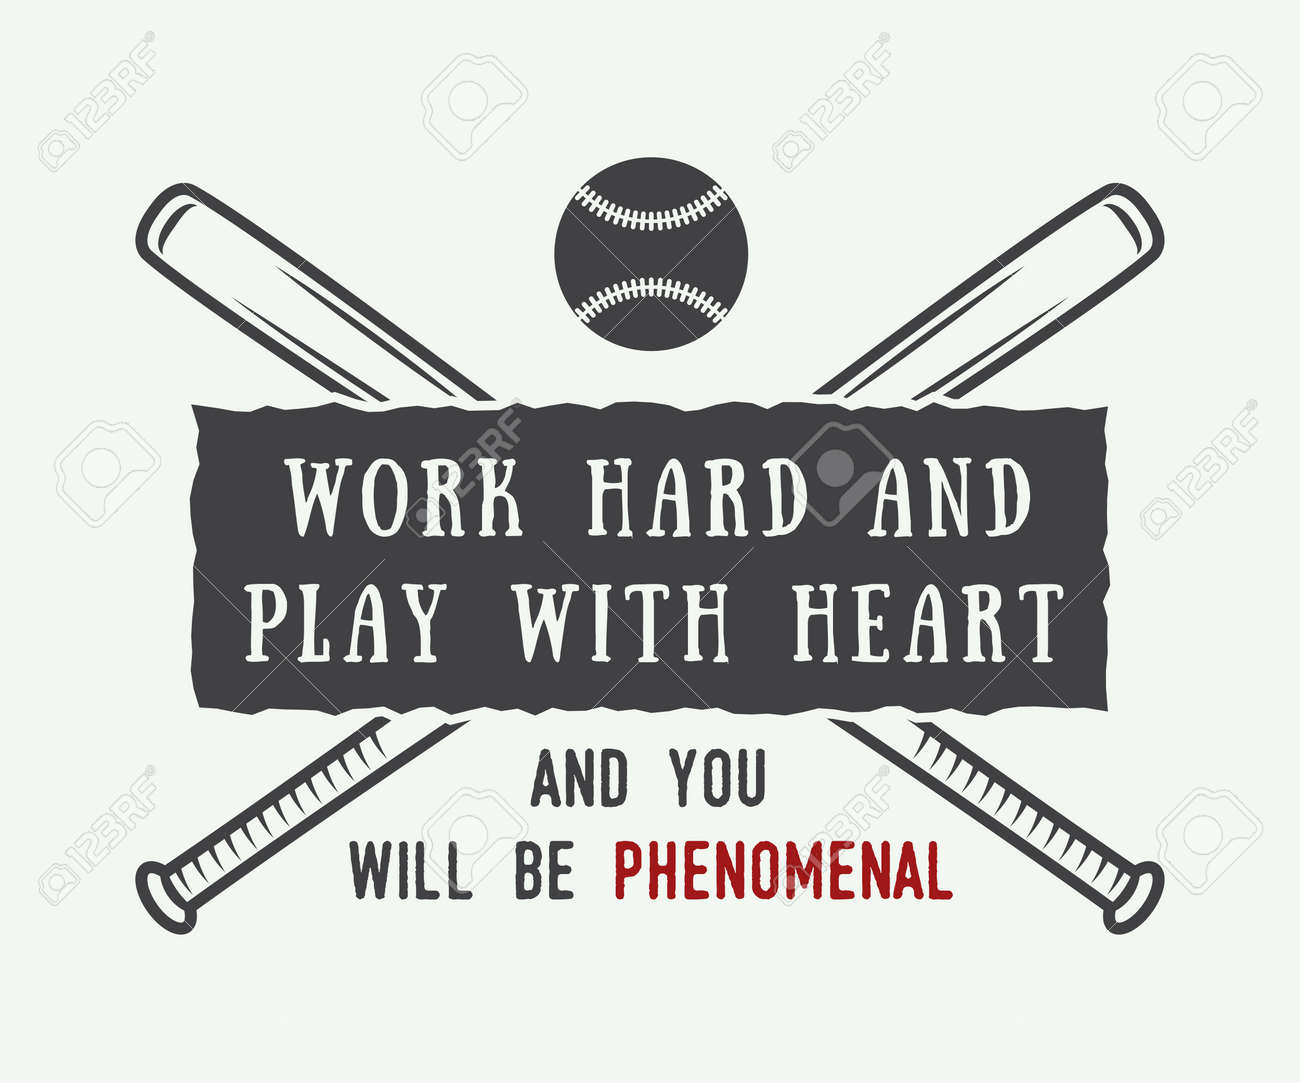 Vintage Baseball Logo Emblem Badge With Slogan And Motivation